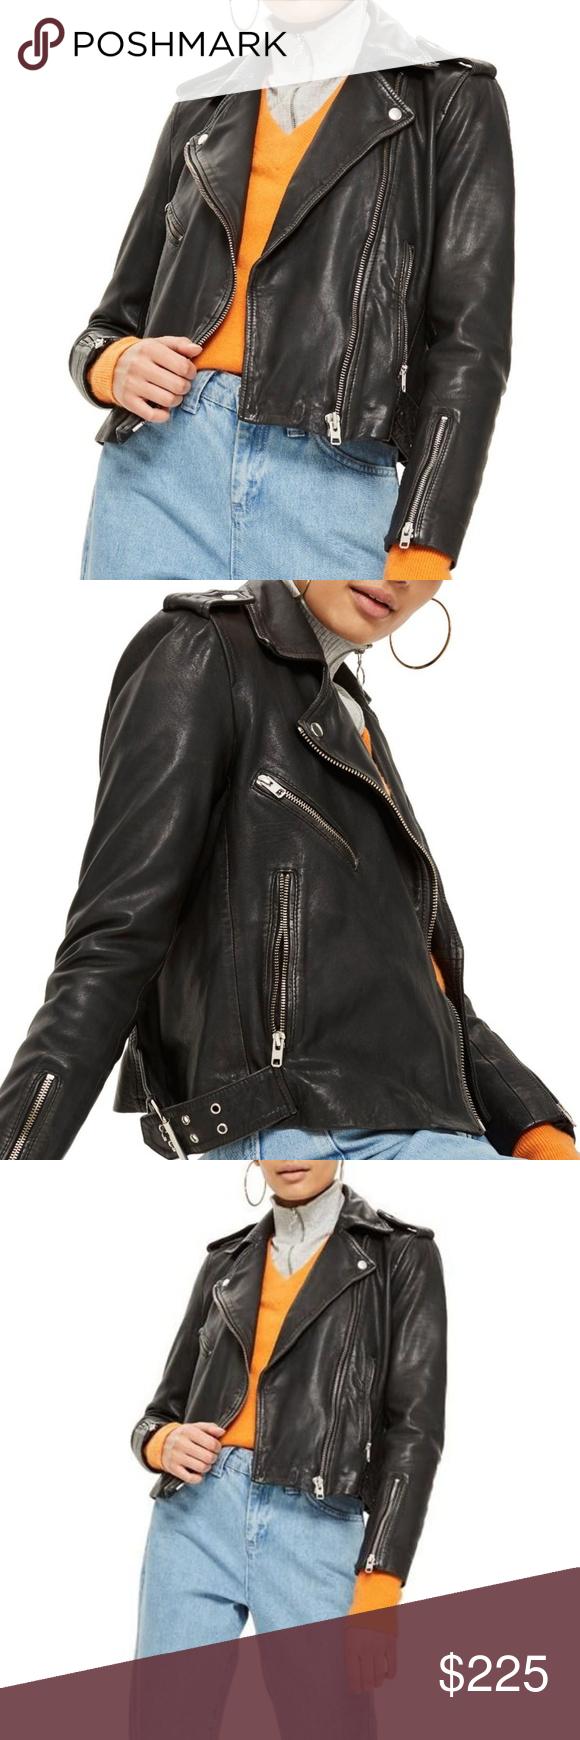 NEW Genuine Leather Jacket Biker Moto NWT (With